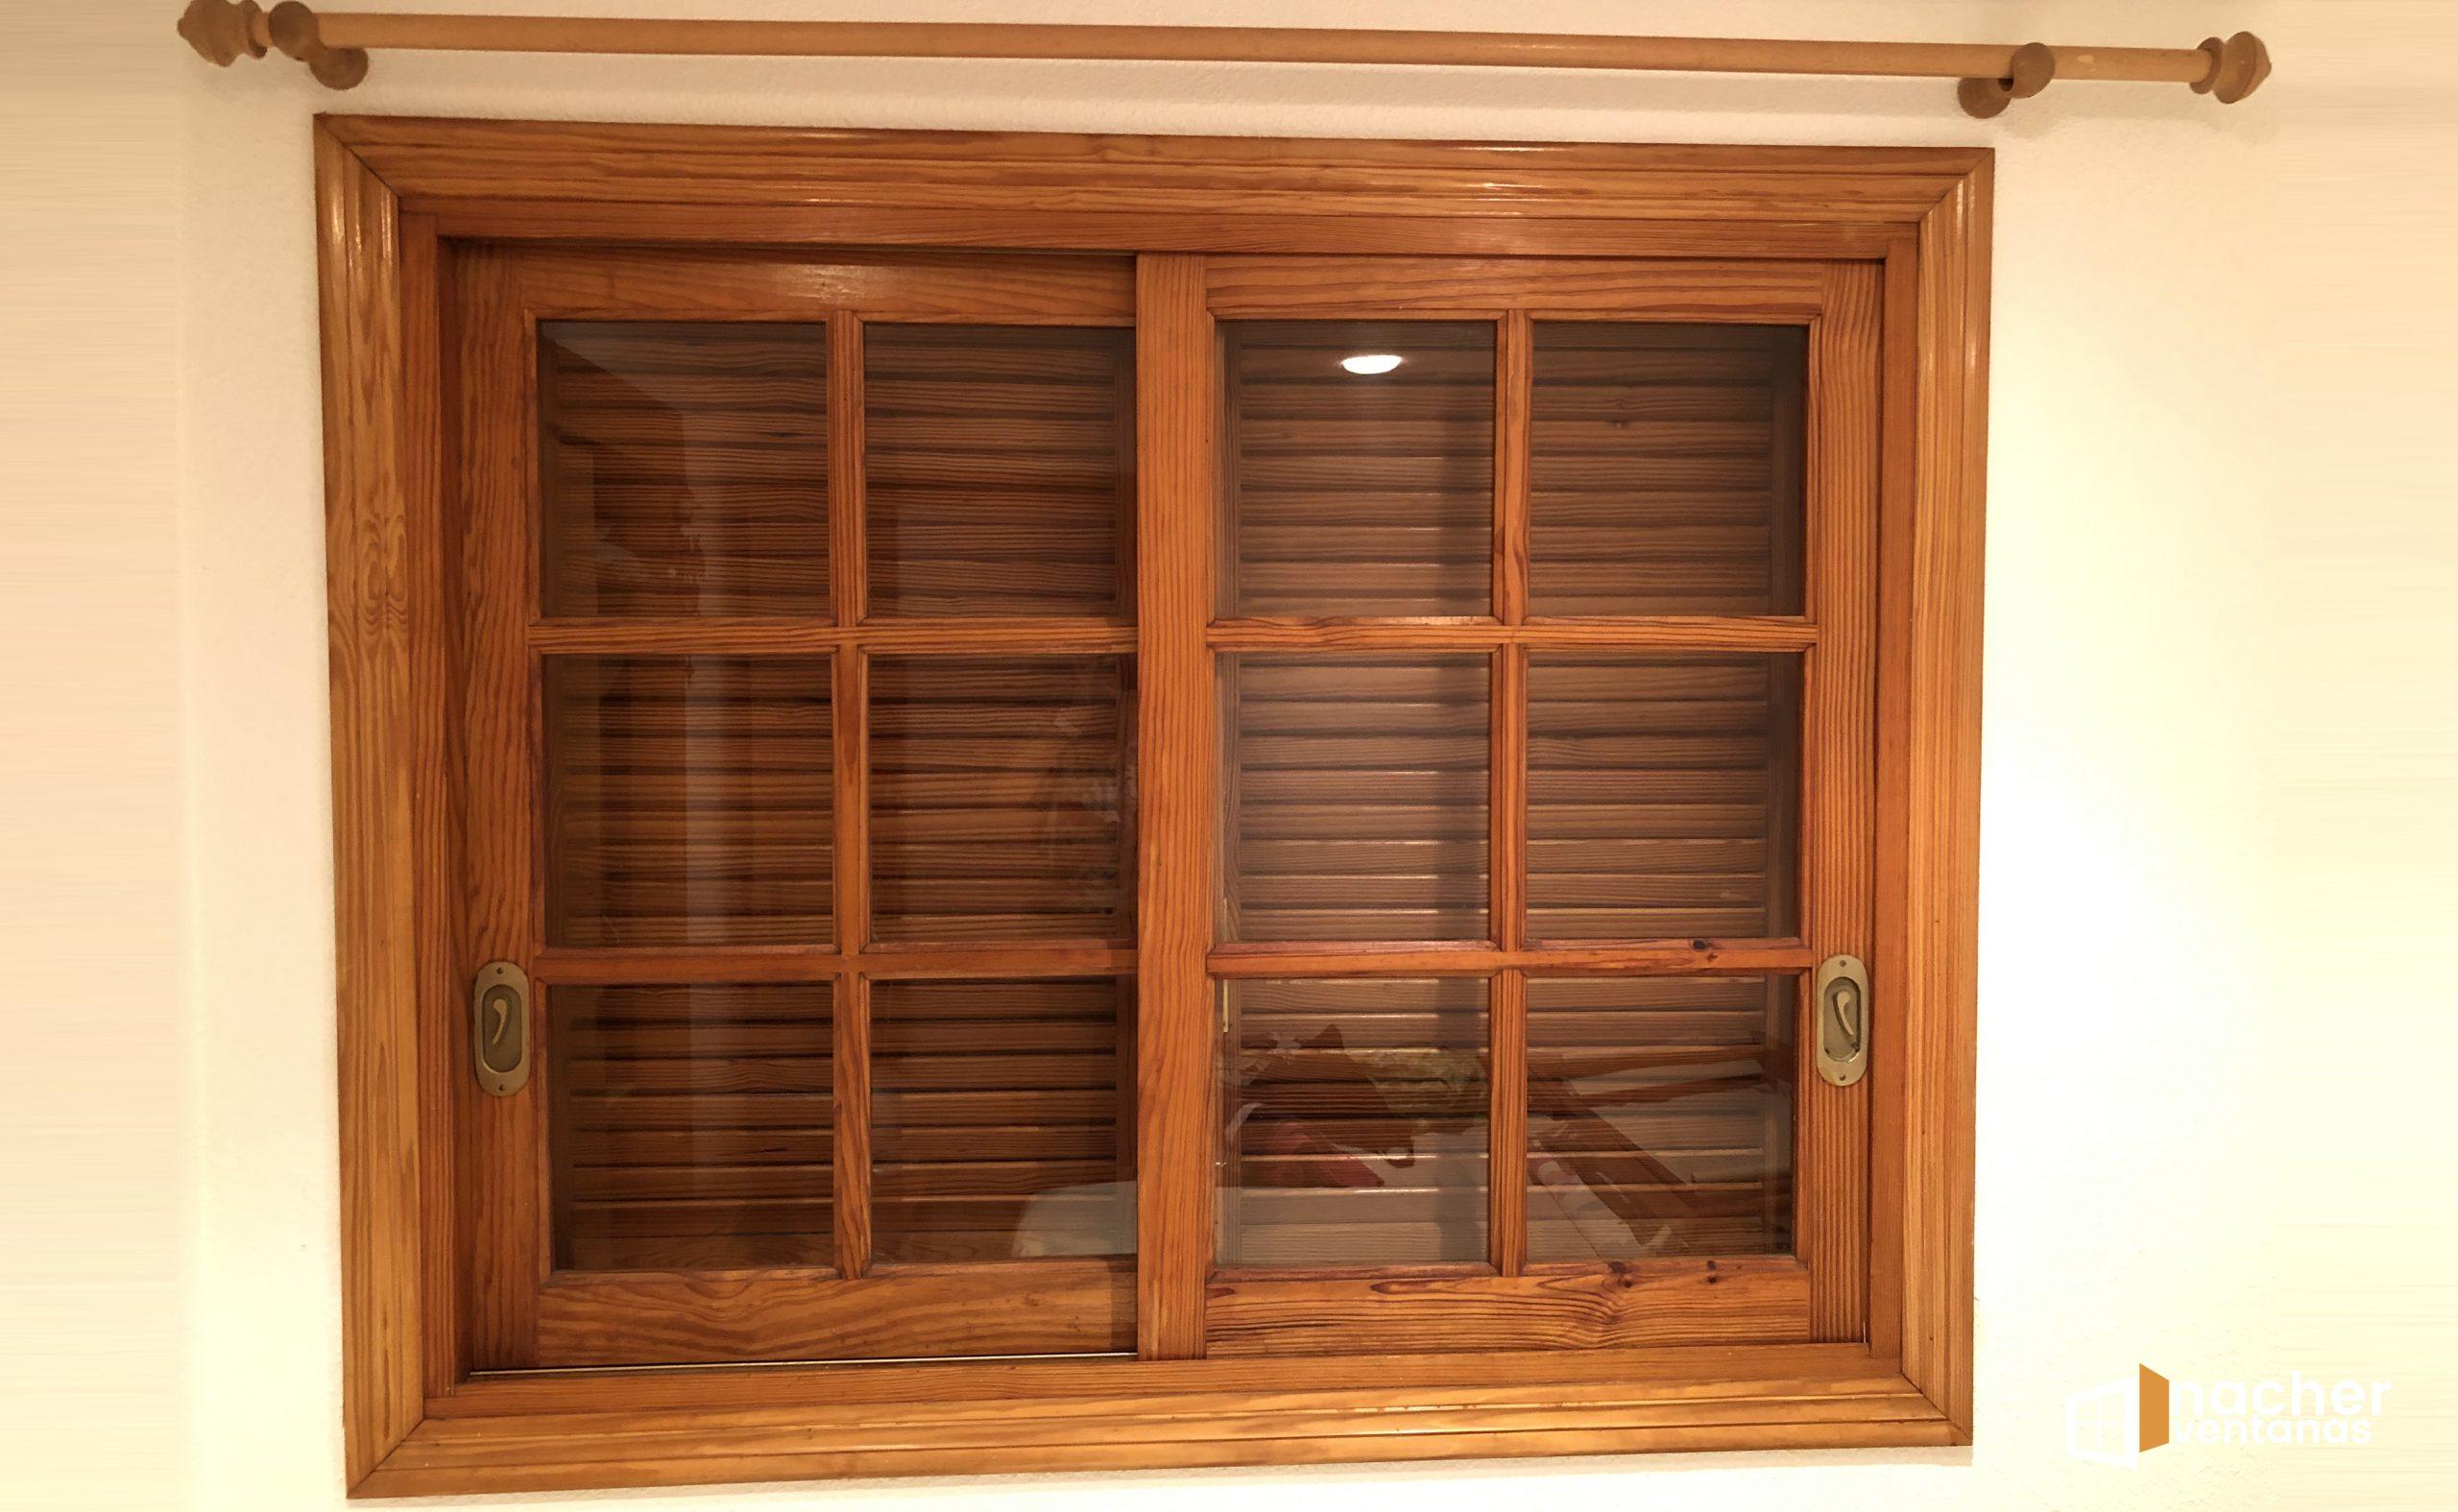 instalacion ventana de aluminio sobre de madera